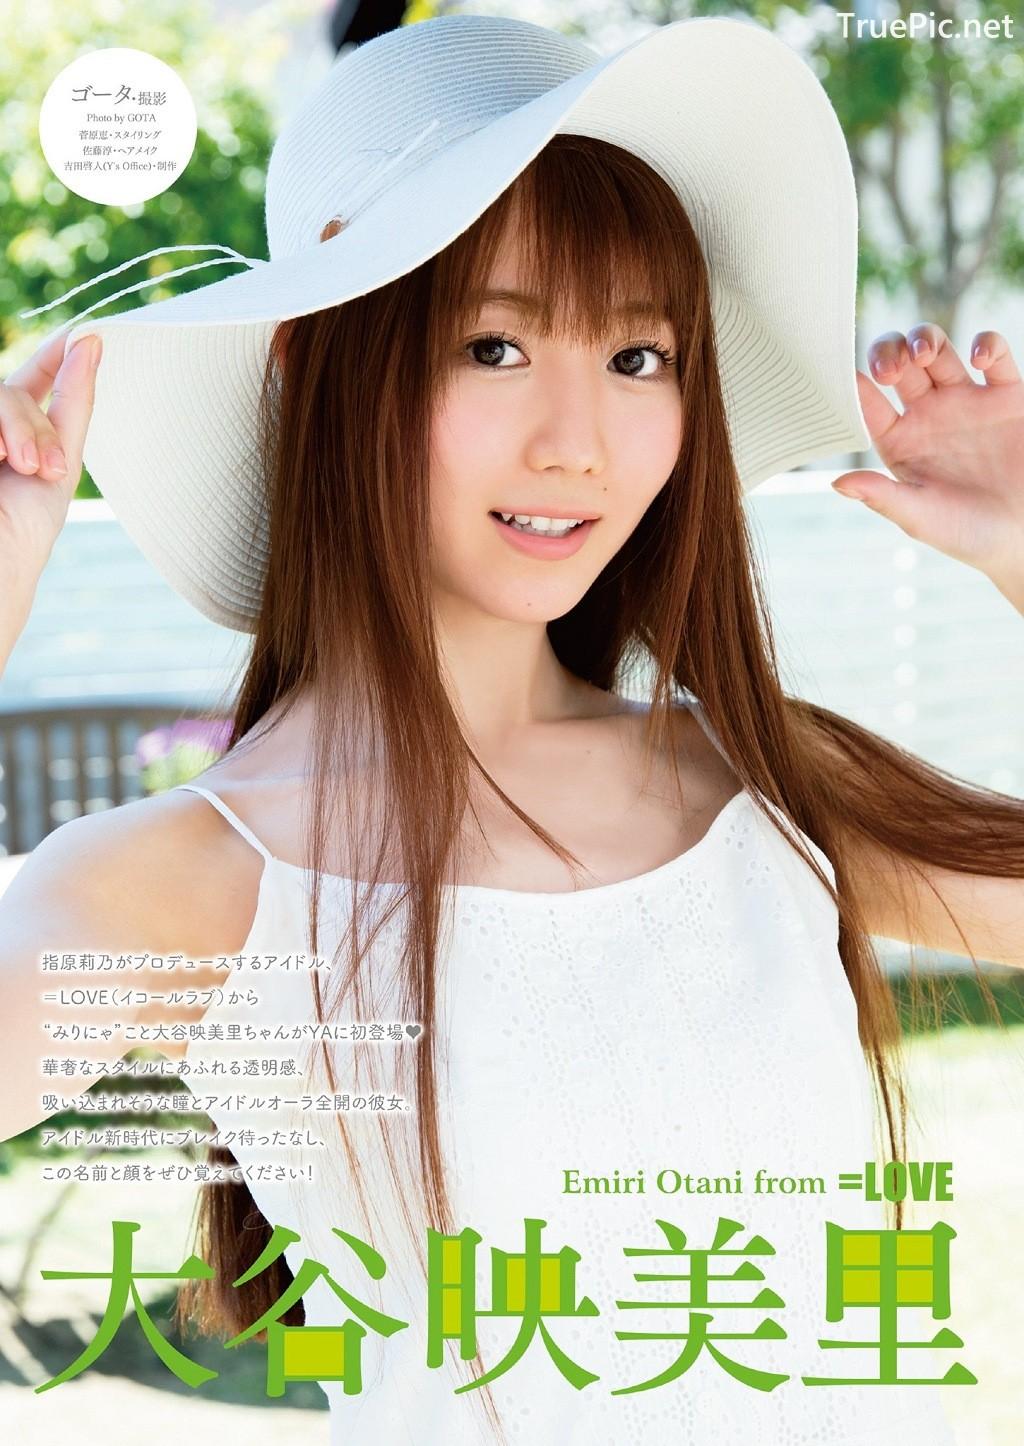 Image Japanese Singer And Idol - Otani Emiri - [Young Animal] 2019 No.13 - TruePic.net - Picture-1